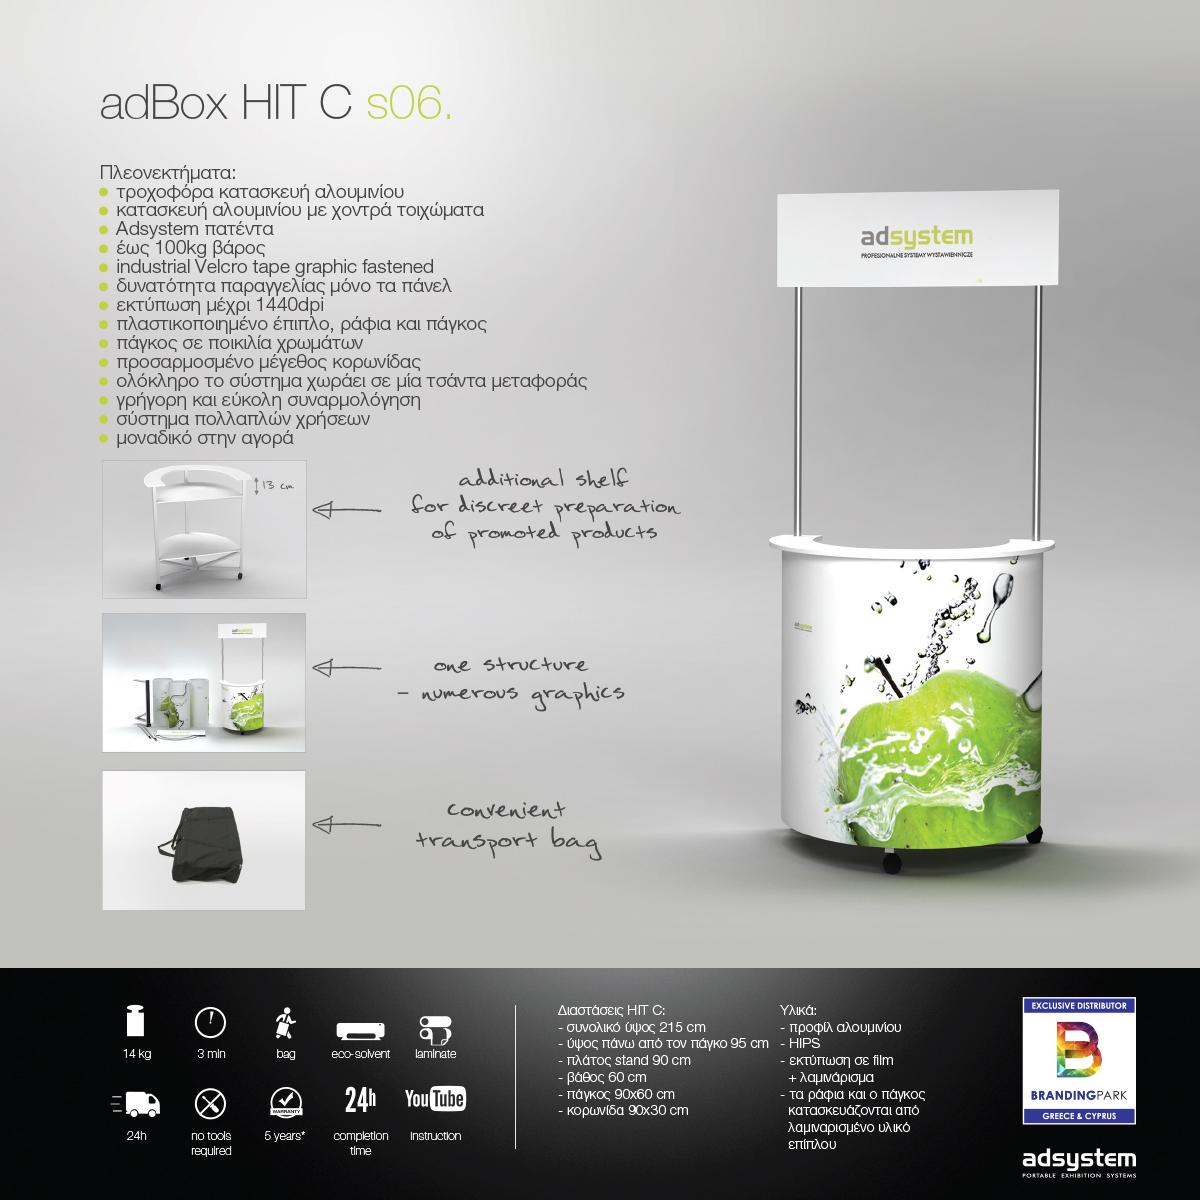 Promo stand adBox HIT C s06. - Μοντέρνα Συστήματα Προβολής